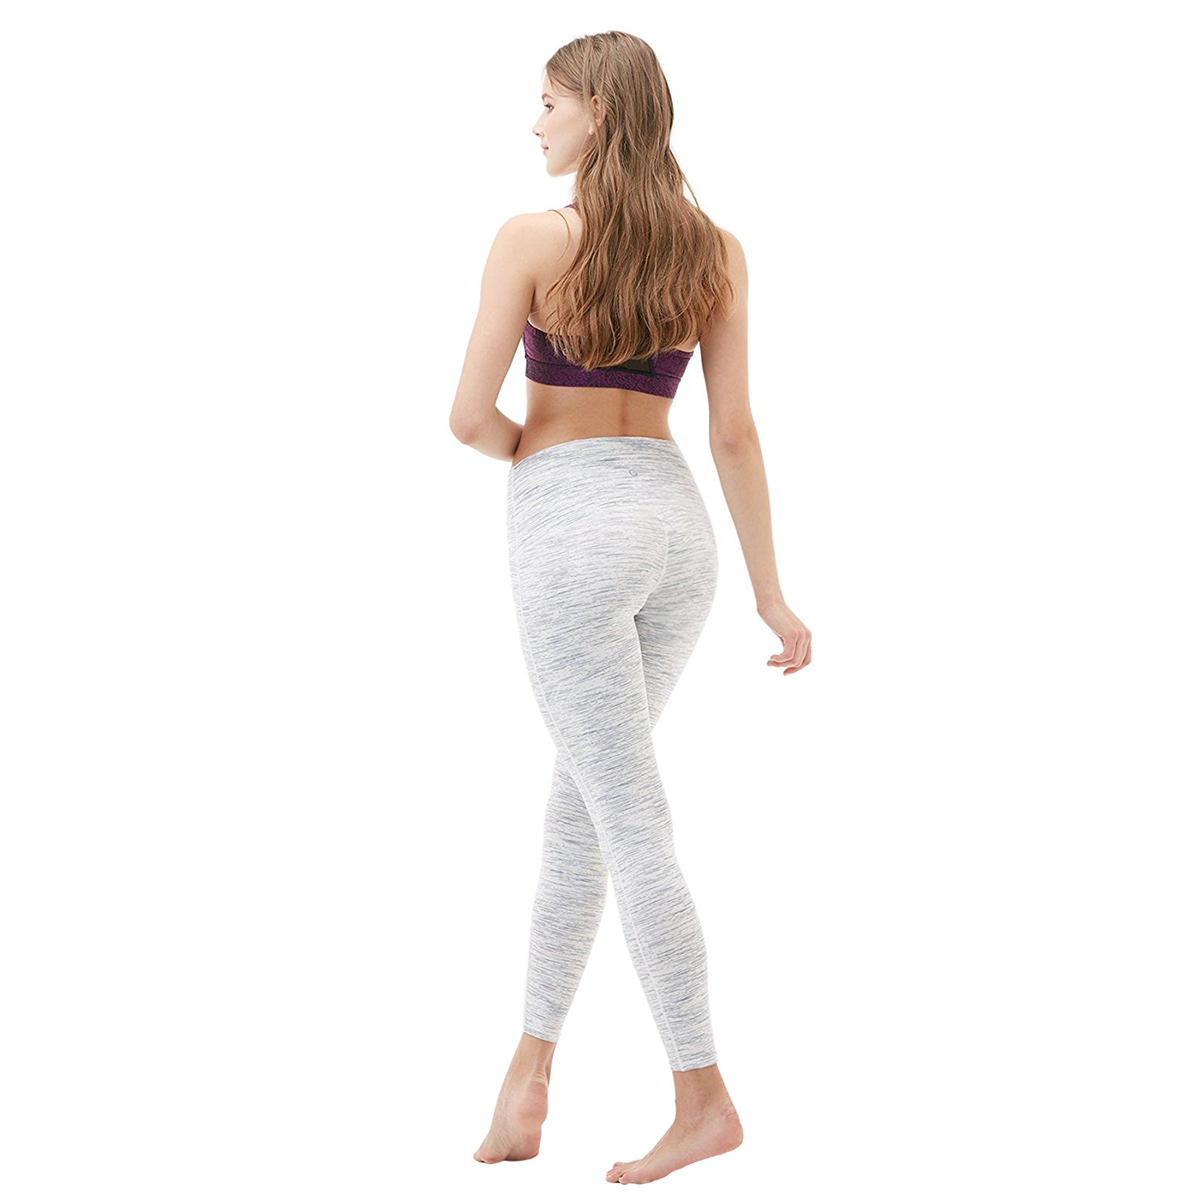 thumbnail 104 - TSLA Tesla FYP42 Women's High-Waisted Ultra-Stretch Tummy Control Yoga Pants